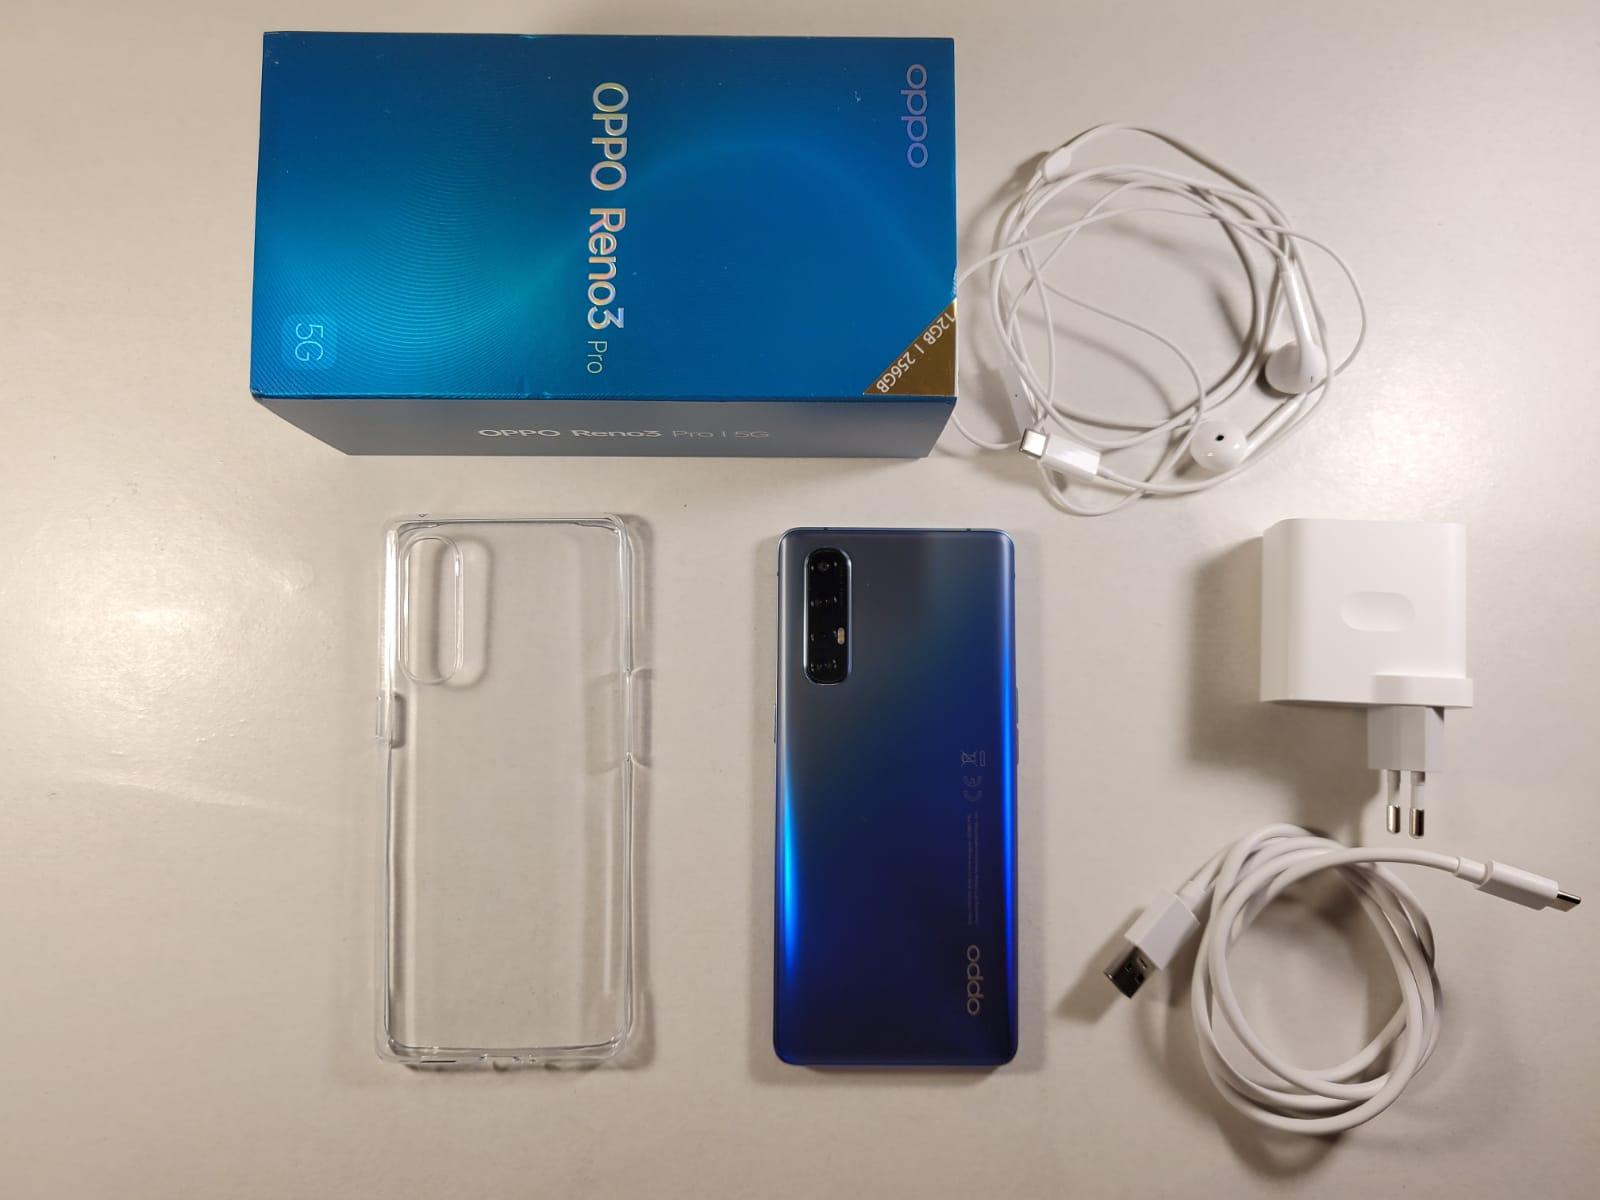 Unboxing și primele impresii Oppo Reno 3 Pro 5G 4